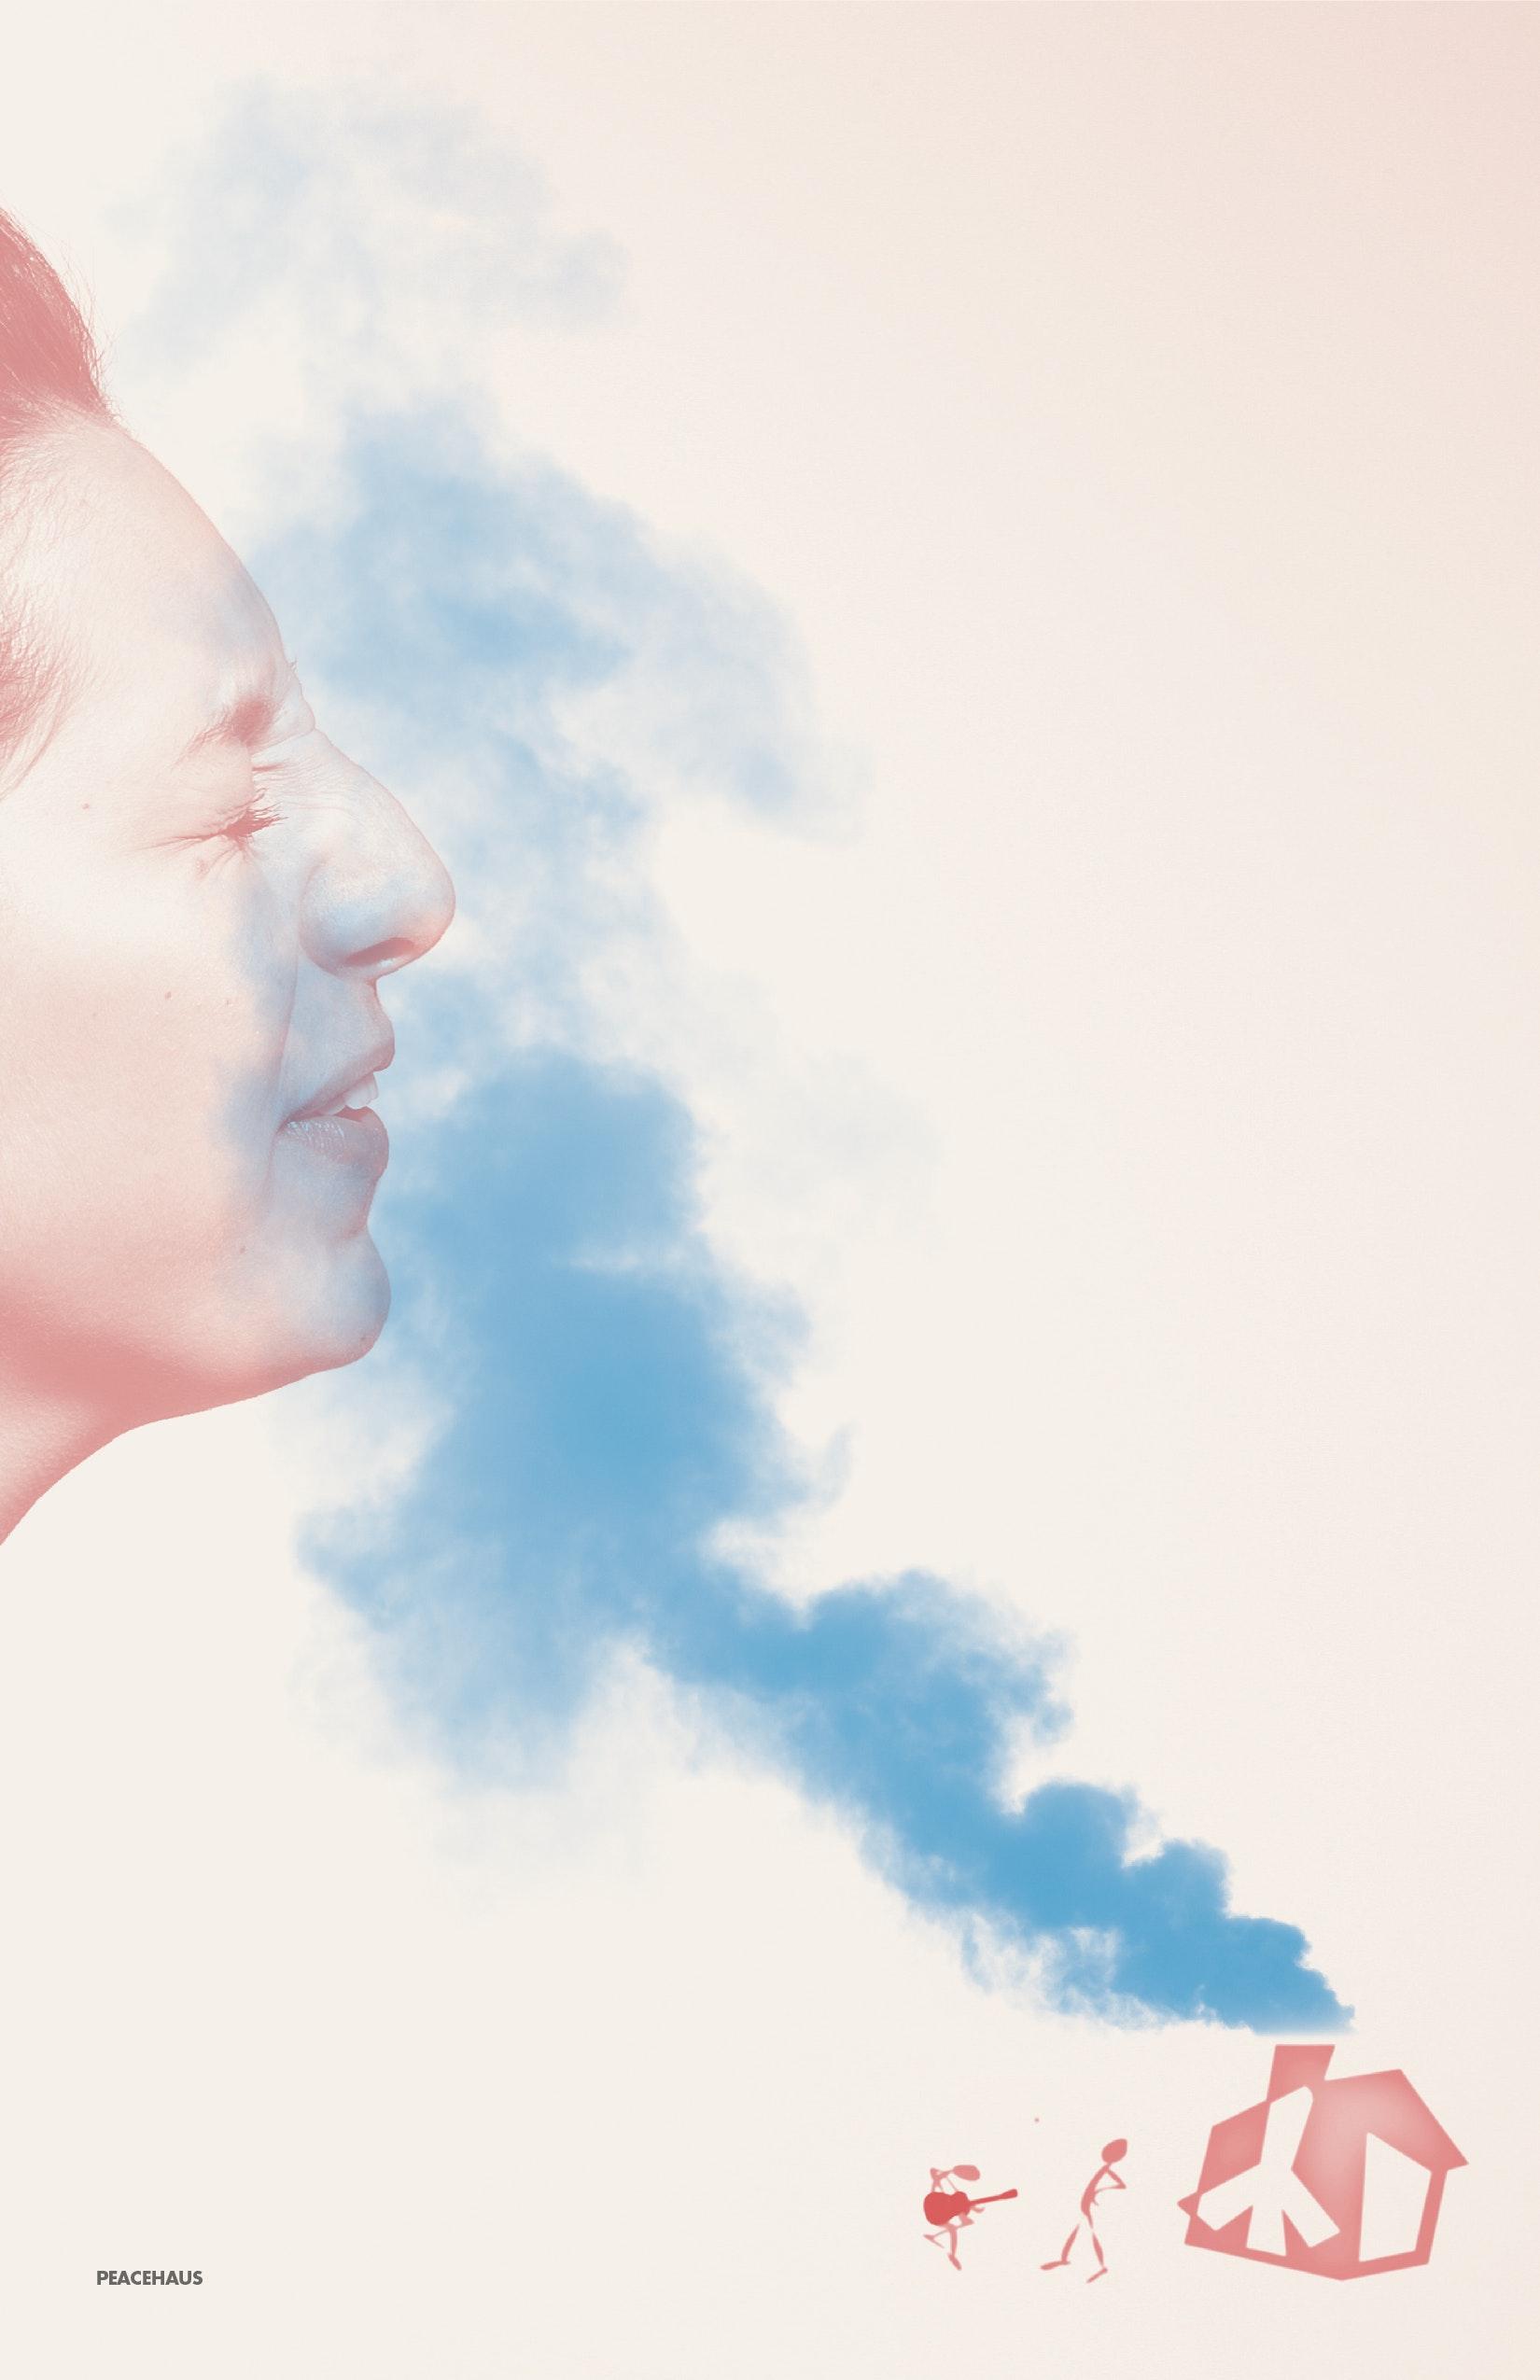 JEFF DOOLEY CREATIVE - smokey face-01